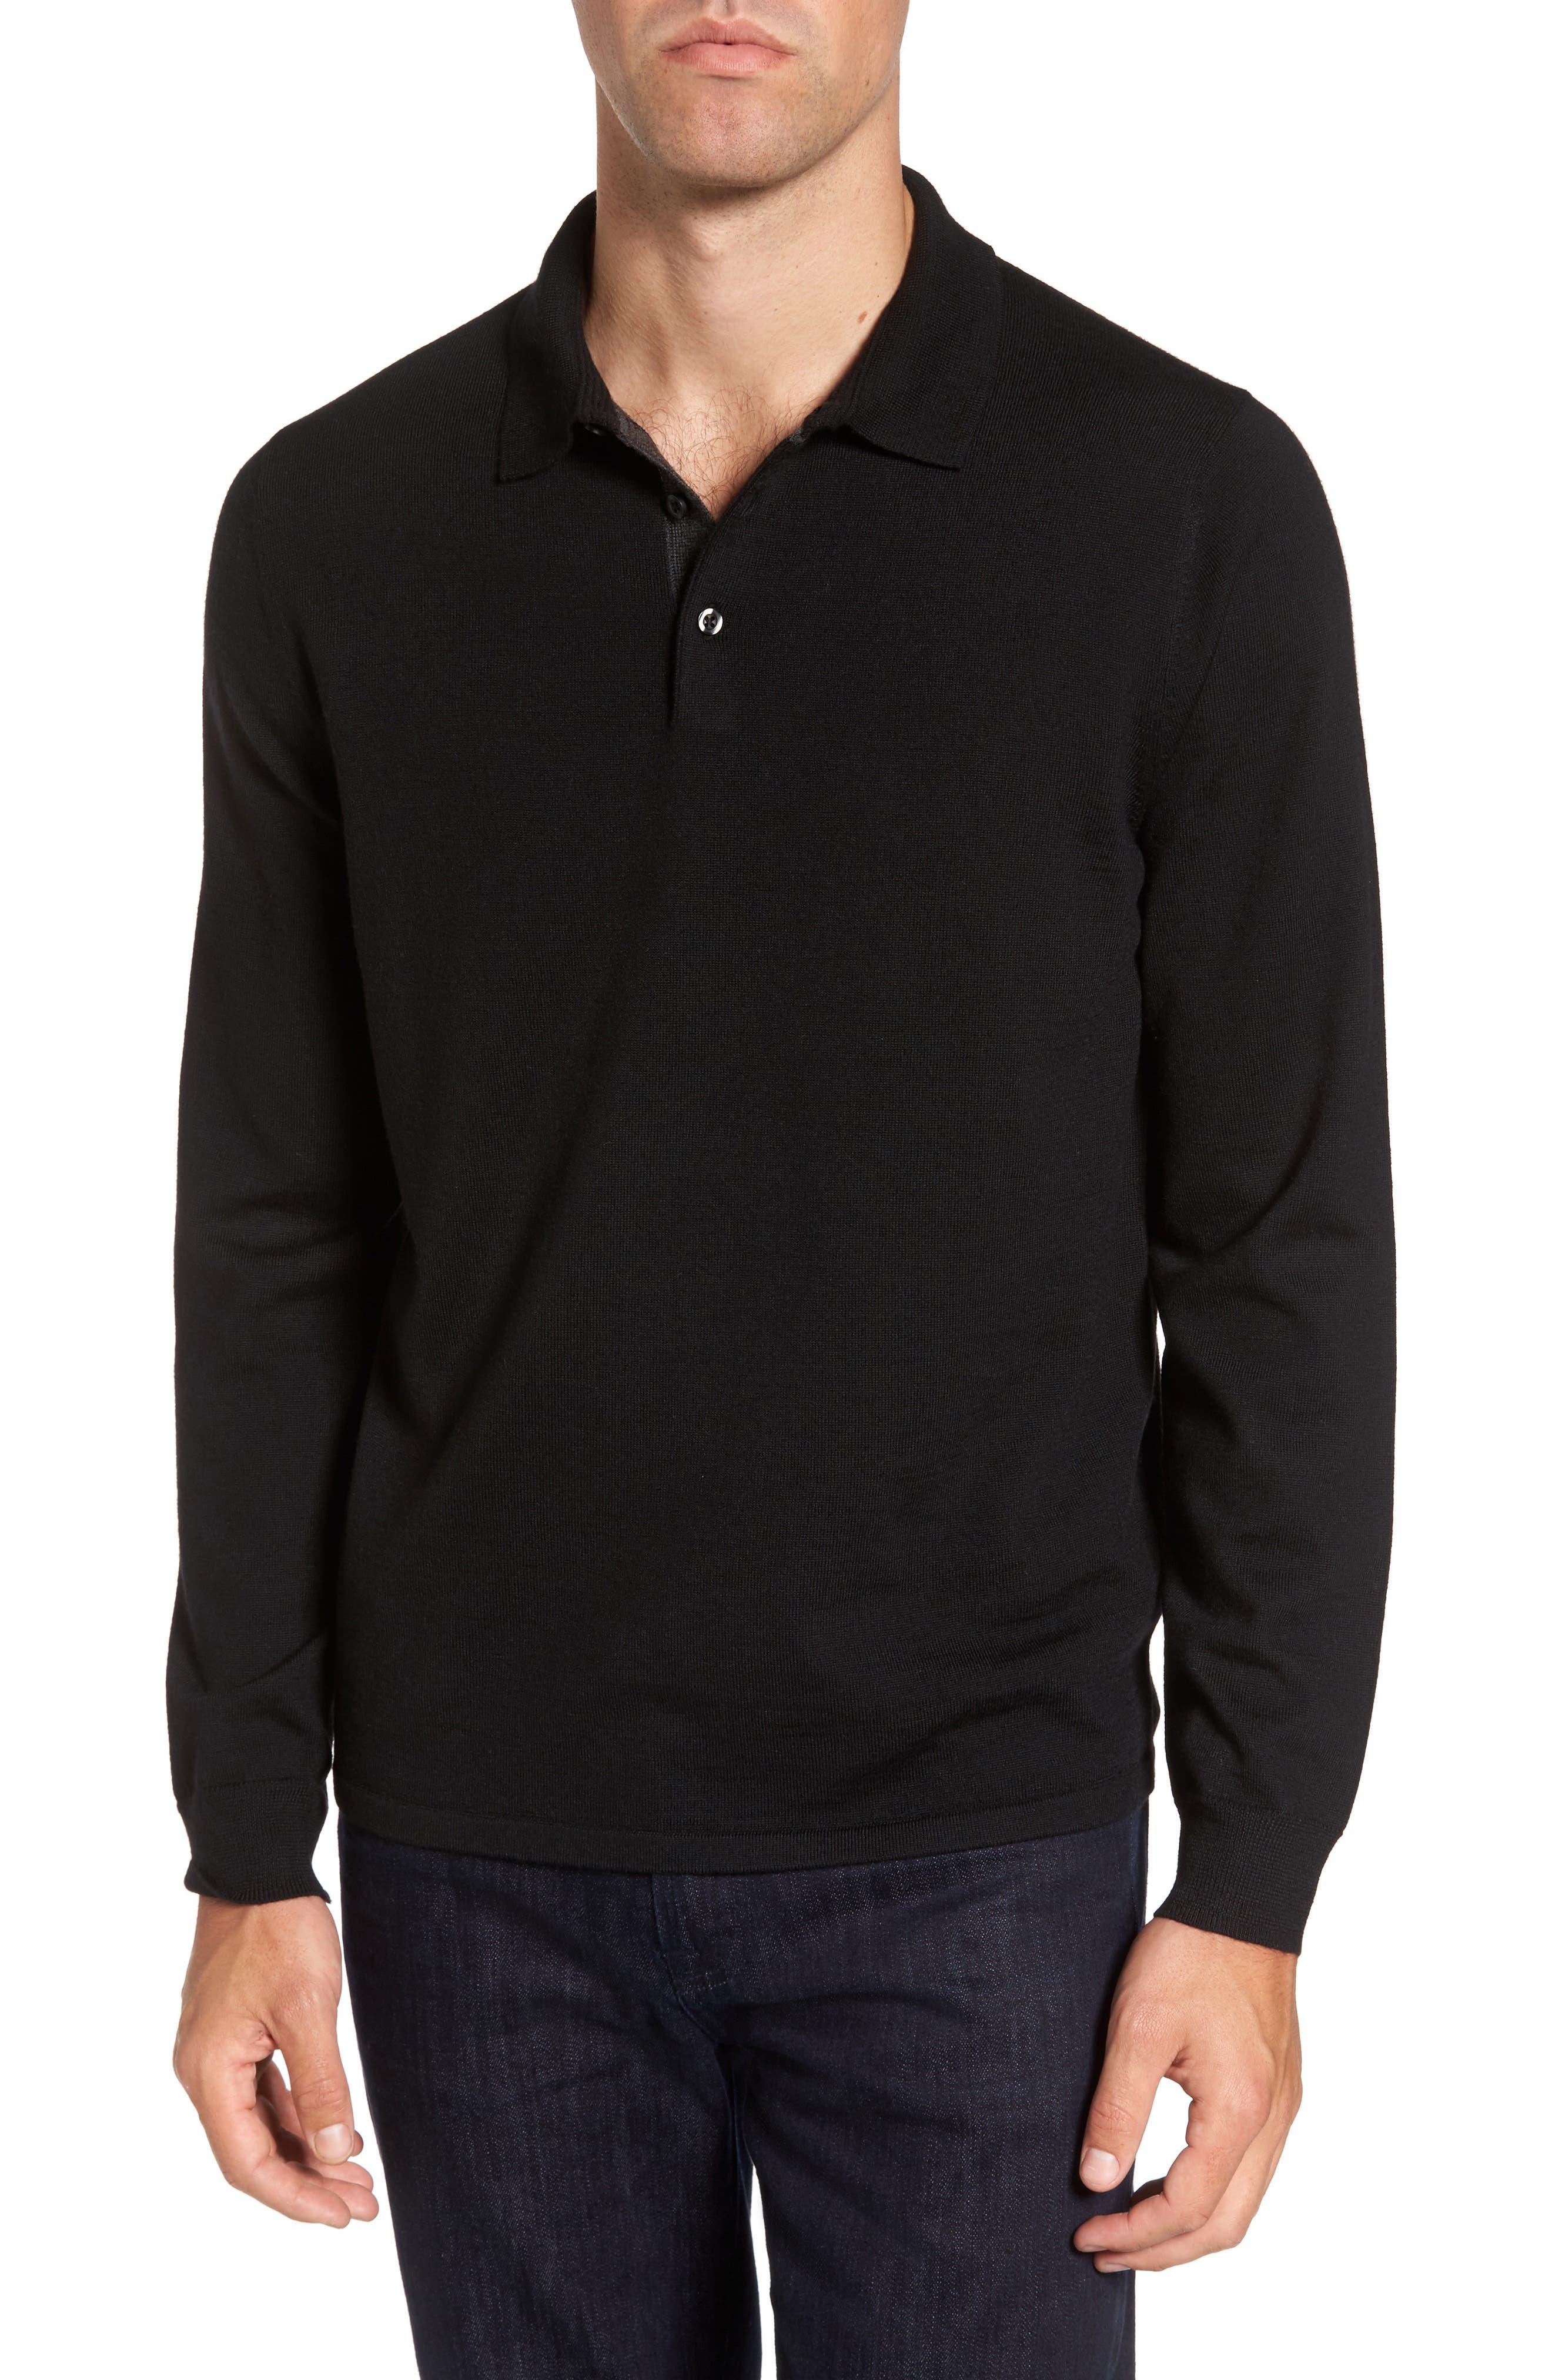 Nordstrom Shop Merino Wool Polo Sweater, Black